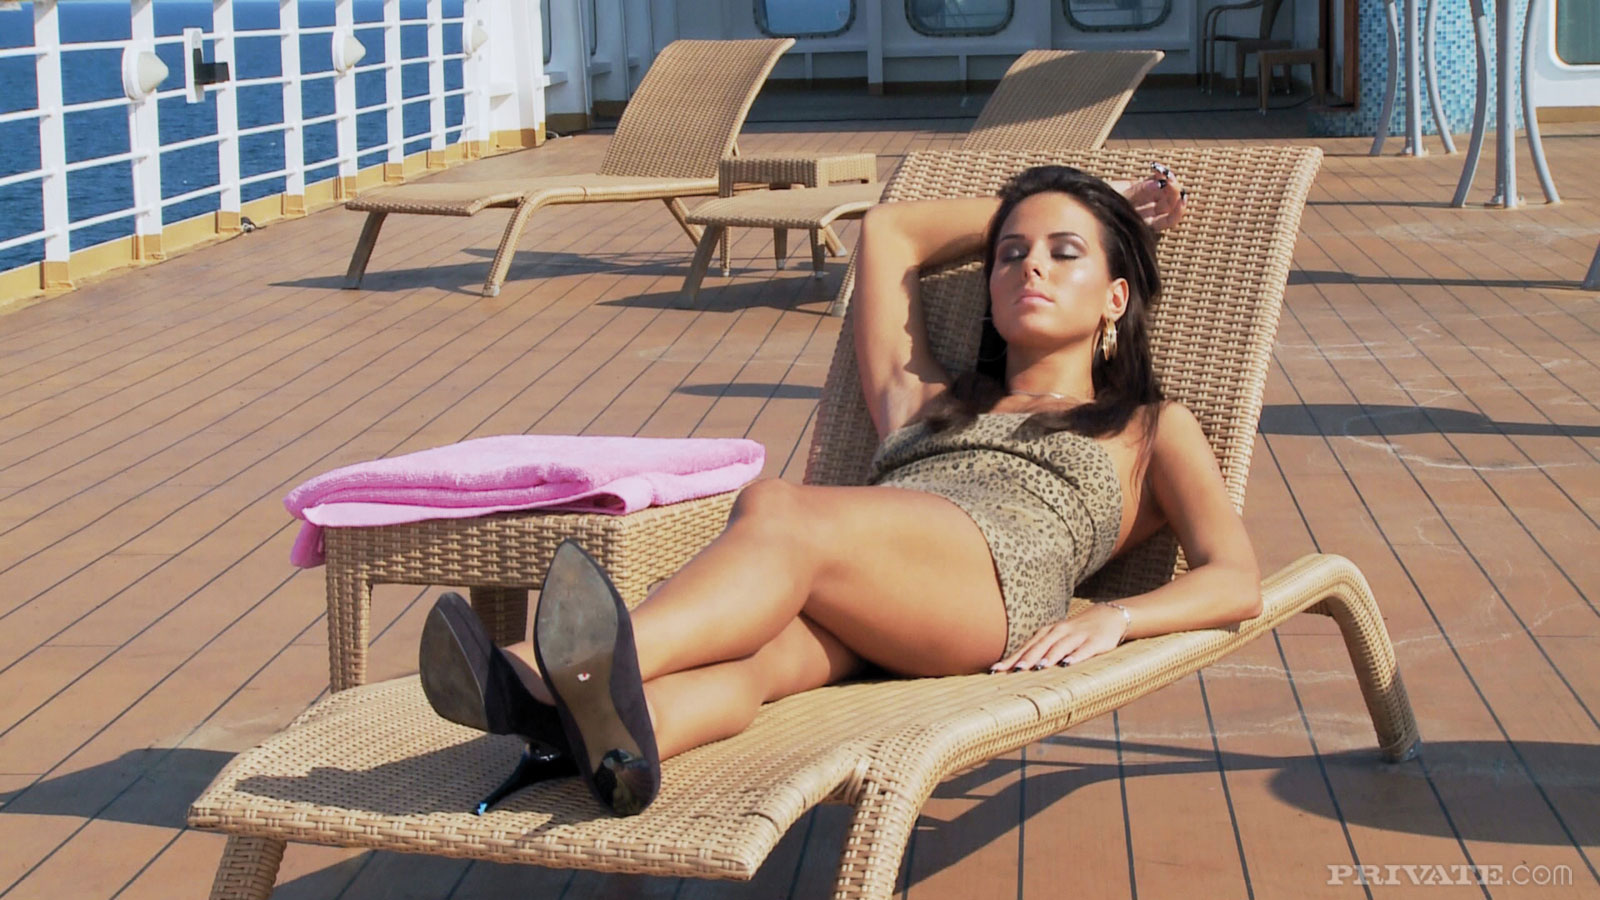 Memphis boat melanie lust